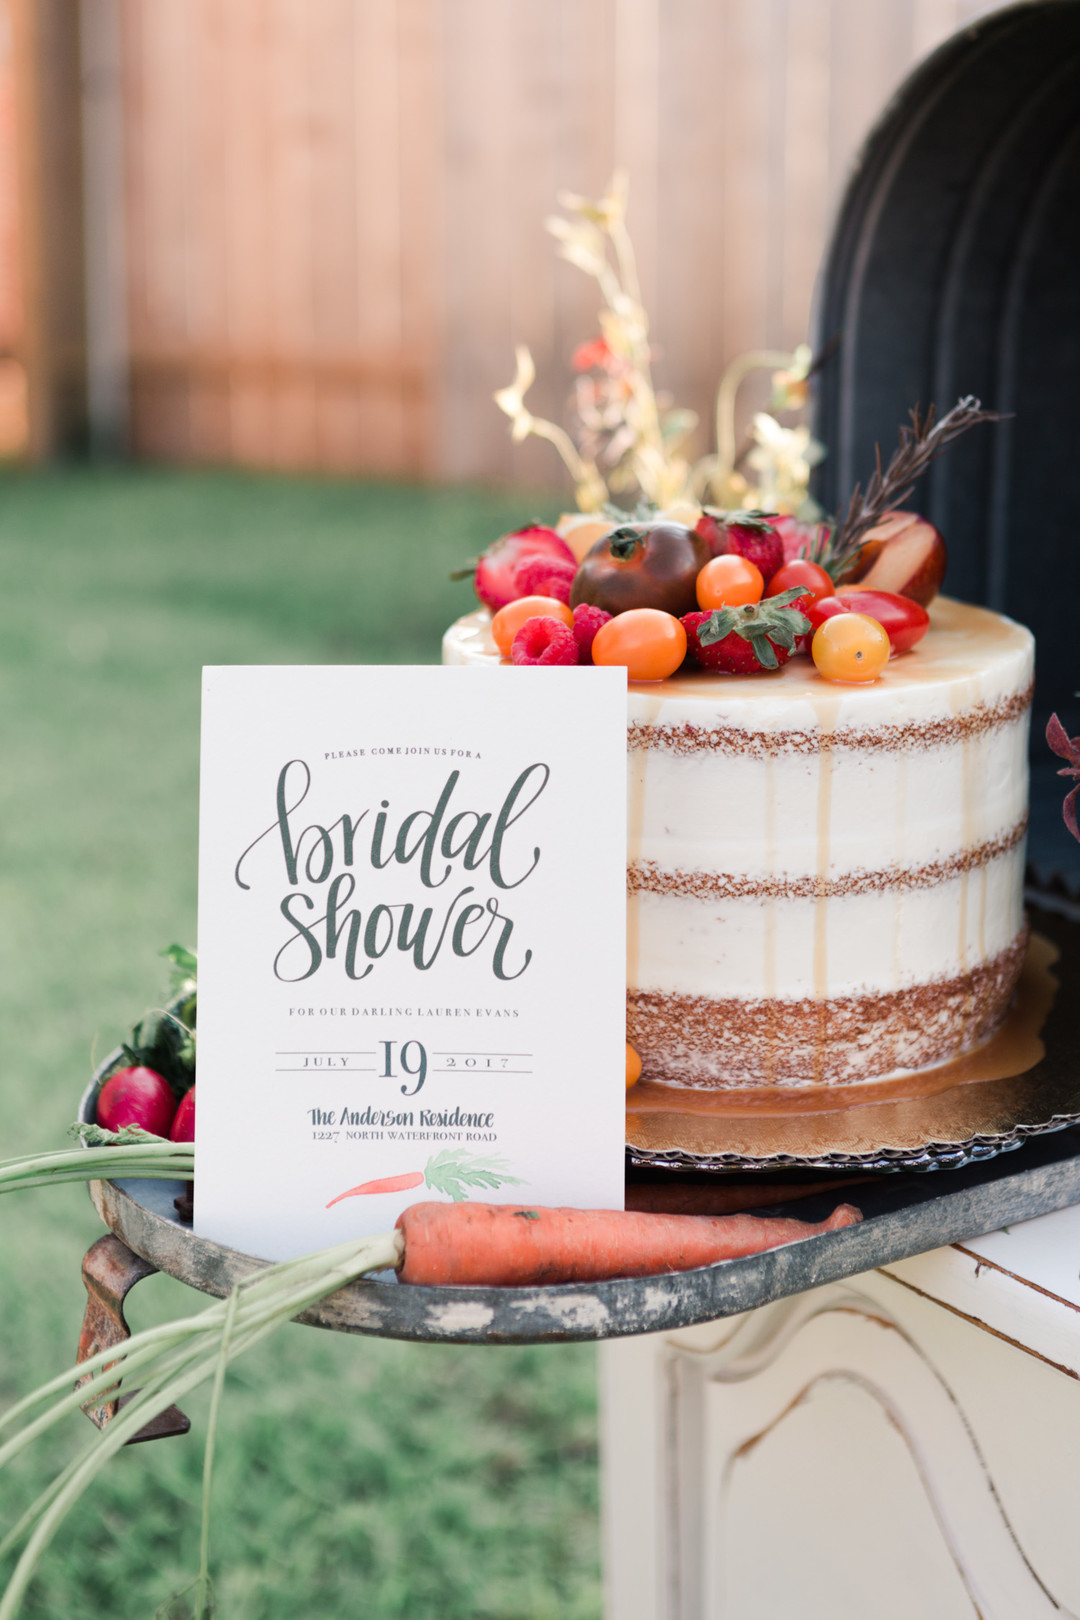 bröllop+möhippa+ideer